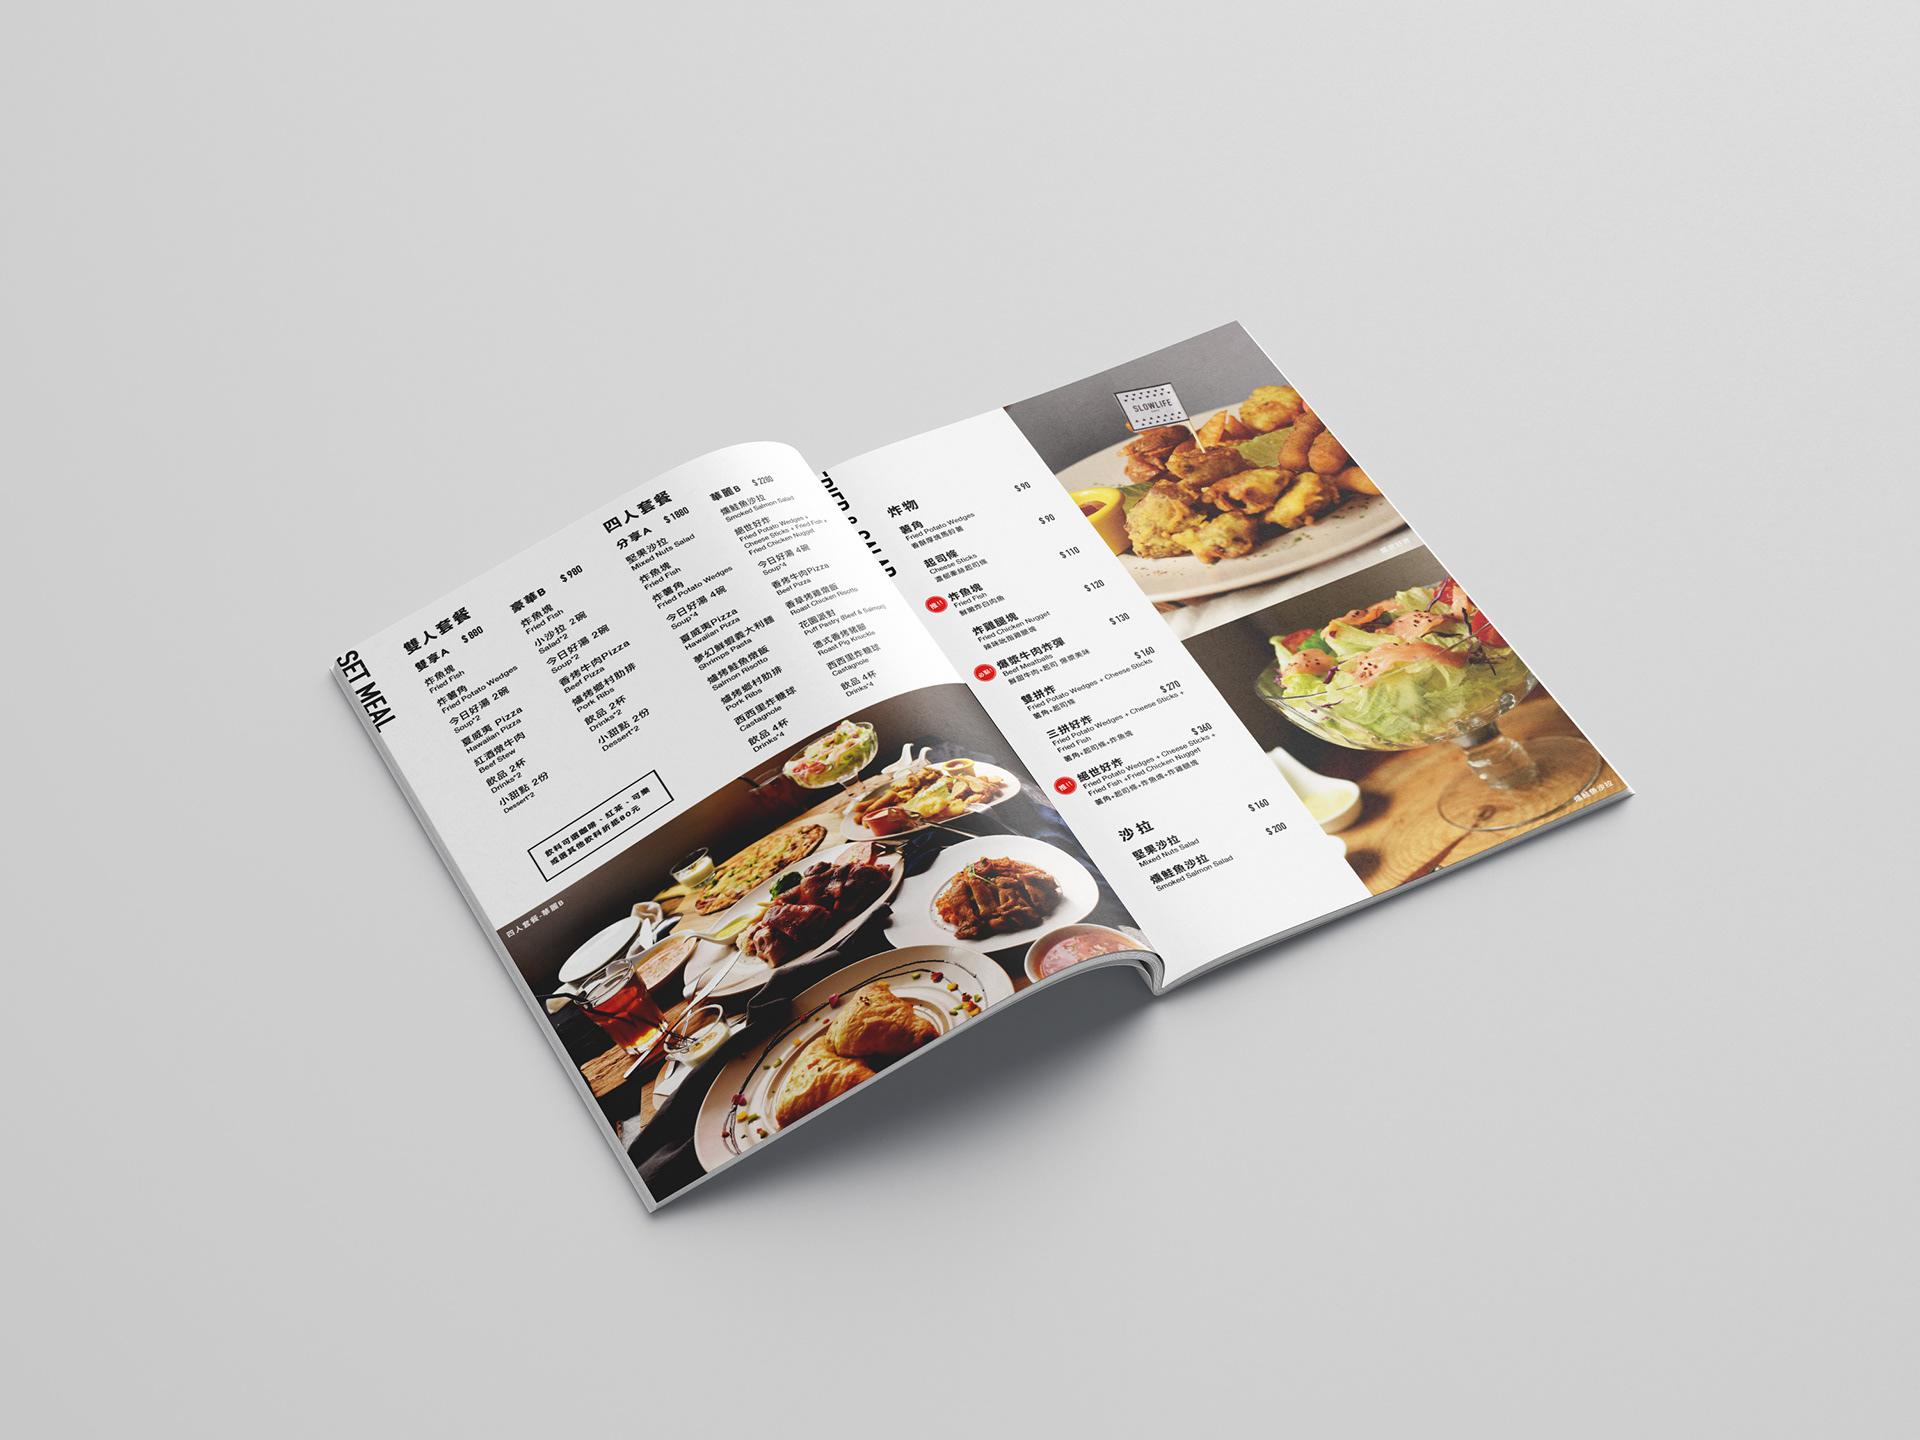 慢慢BISTRO餐厅菜单设计